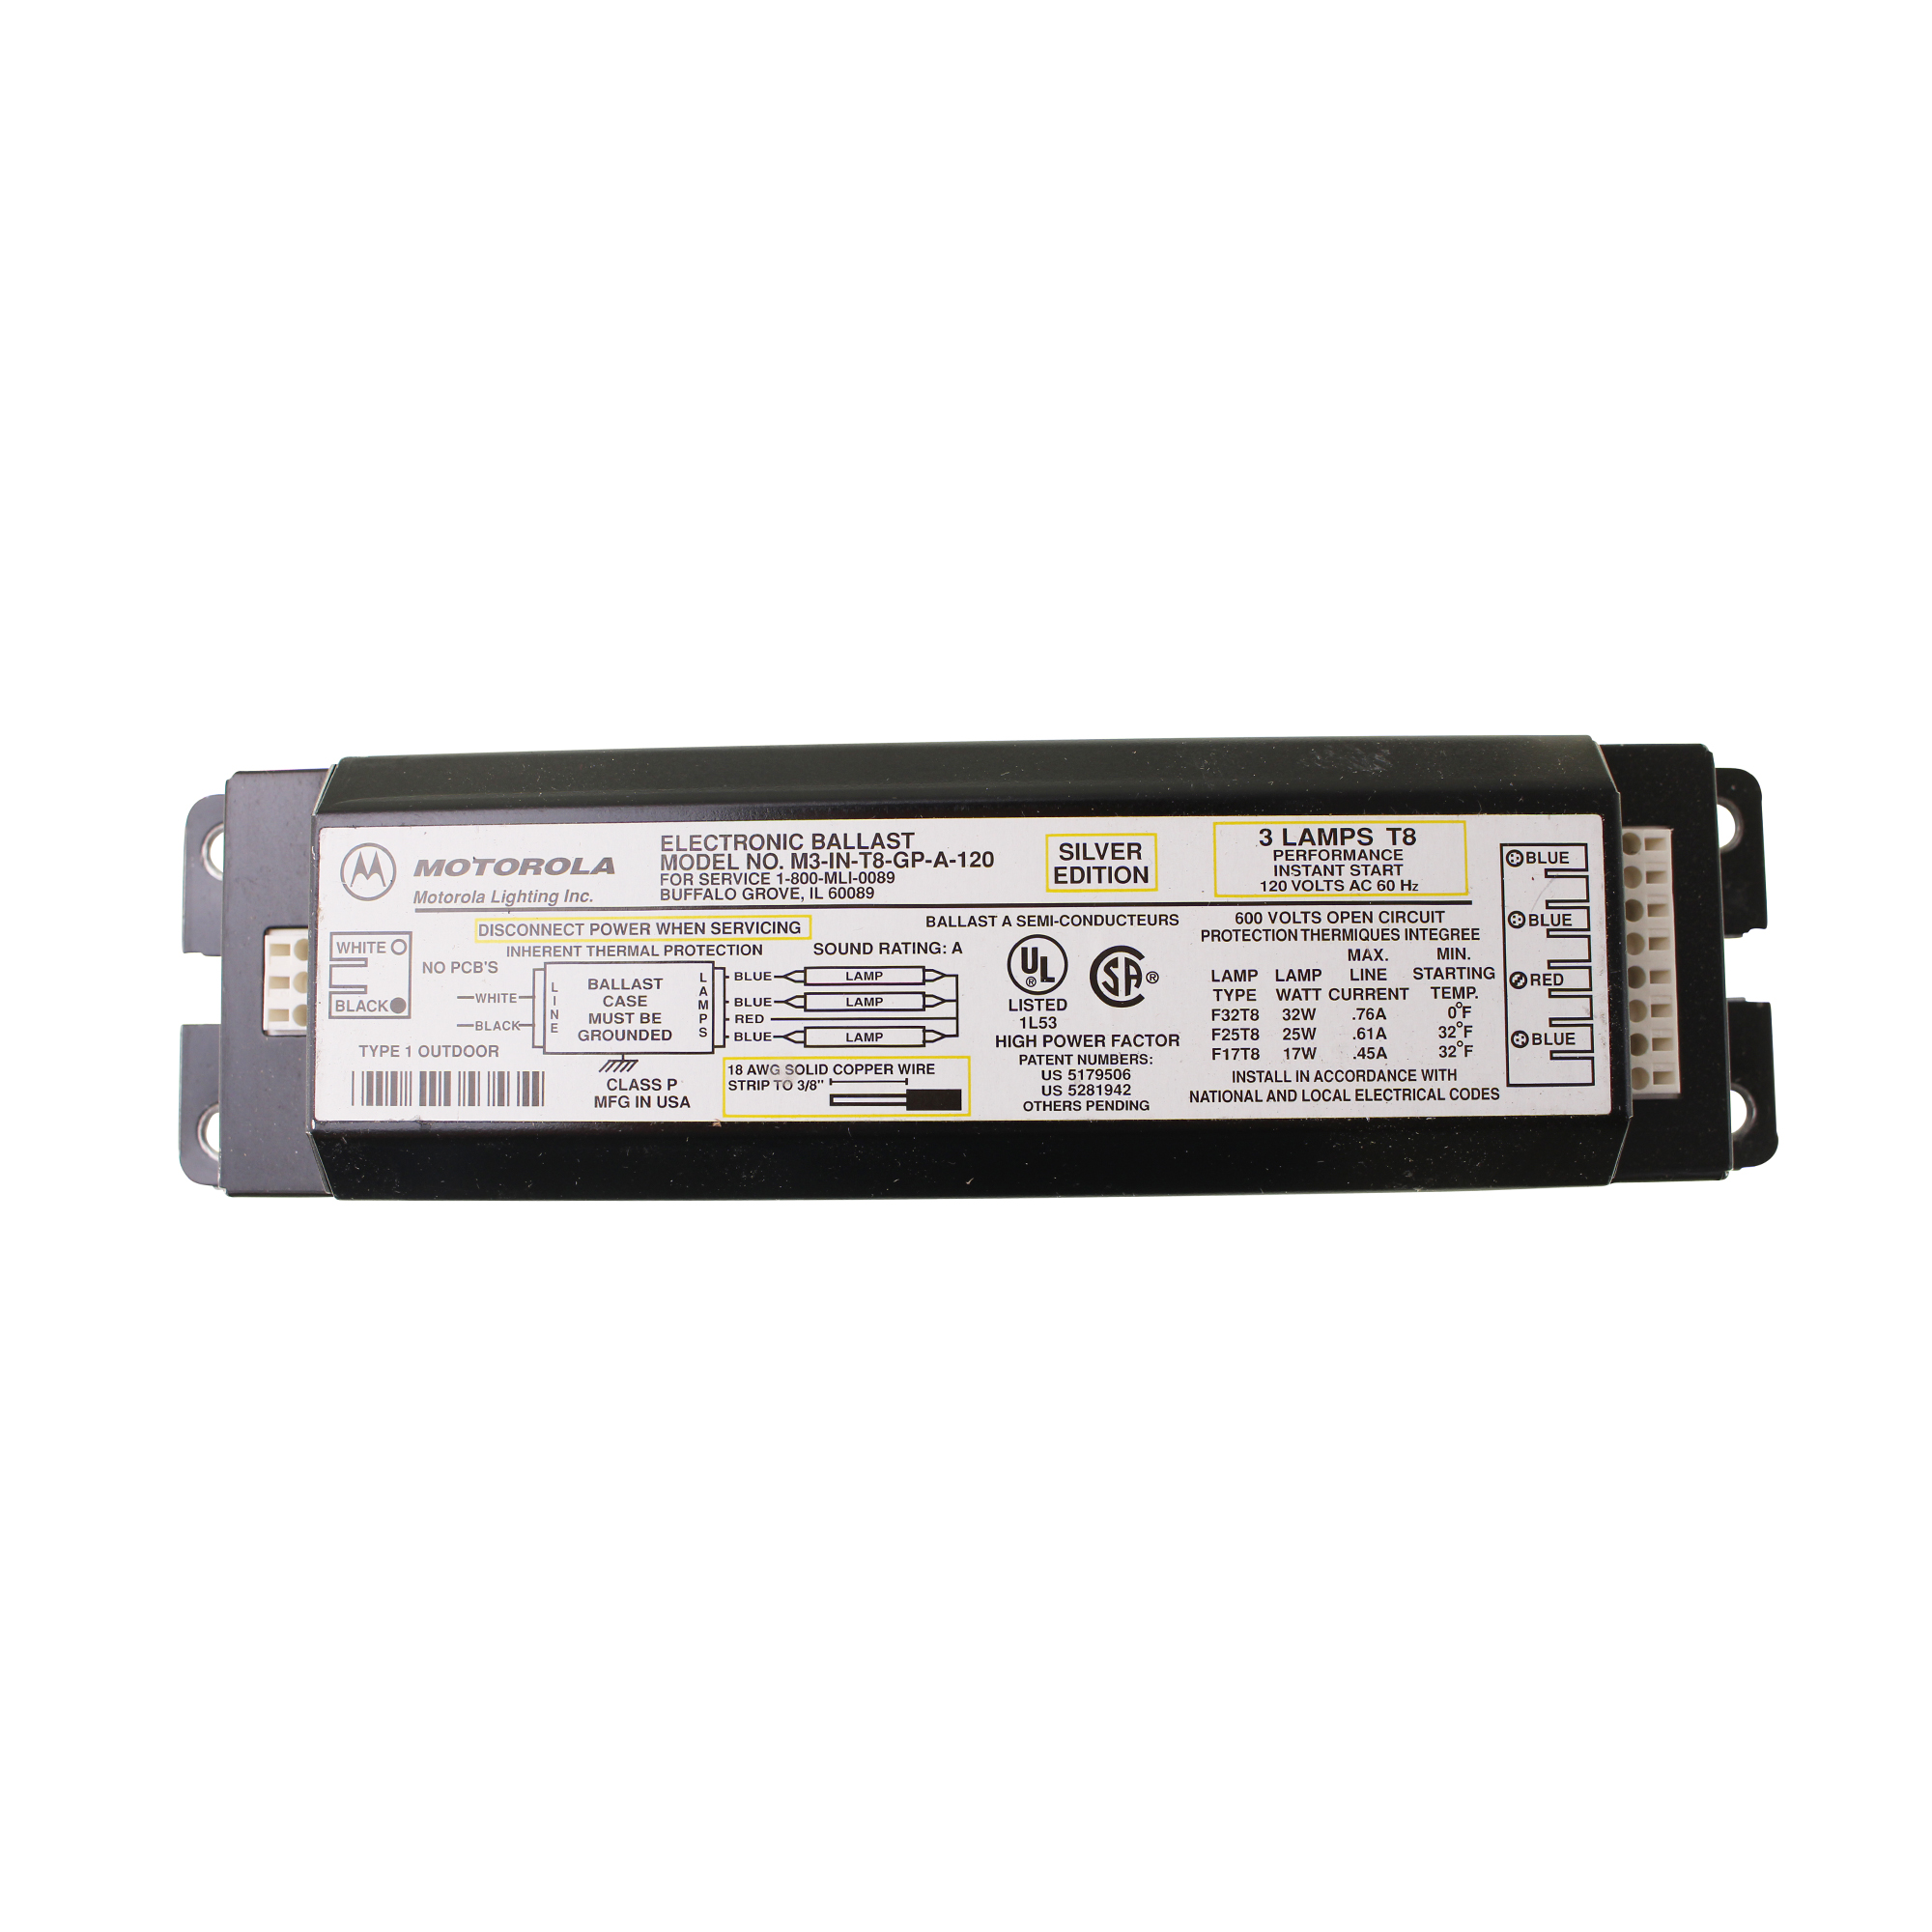 120v ballast wiring diagram air conditioner manual motorola m3 in t8 gp a 120 fluorescent 3 lamp